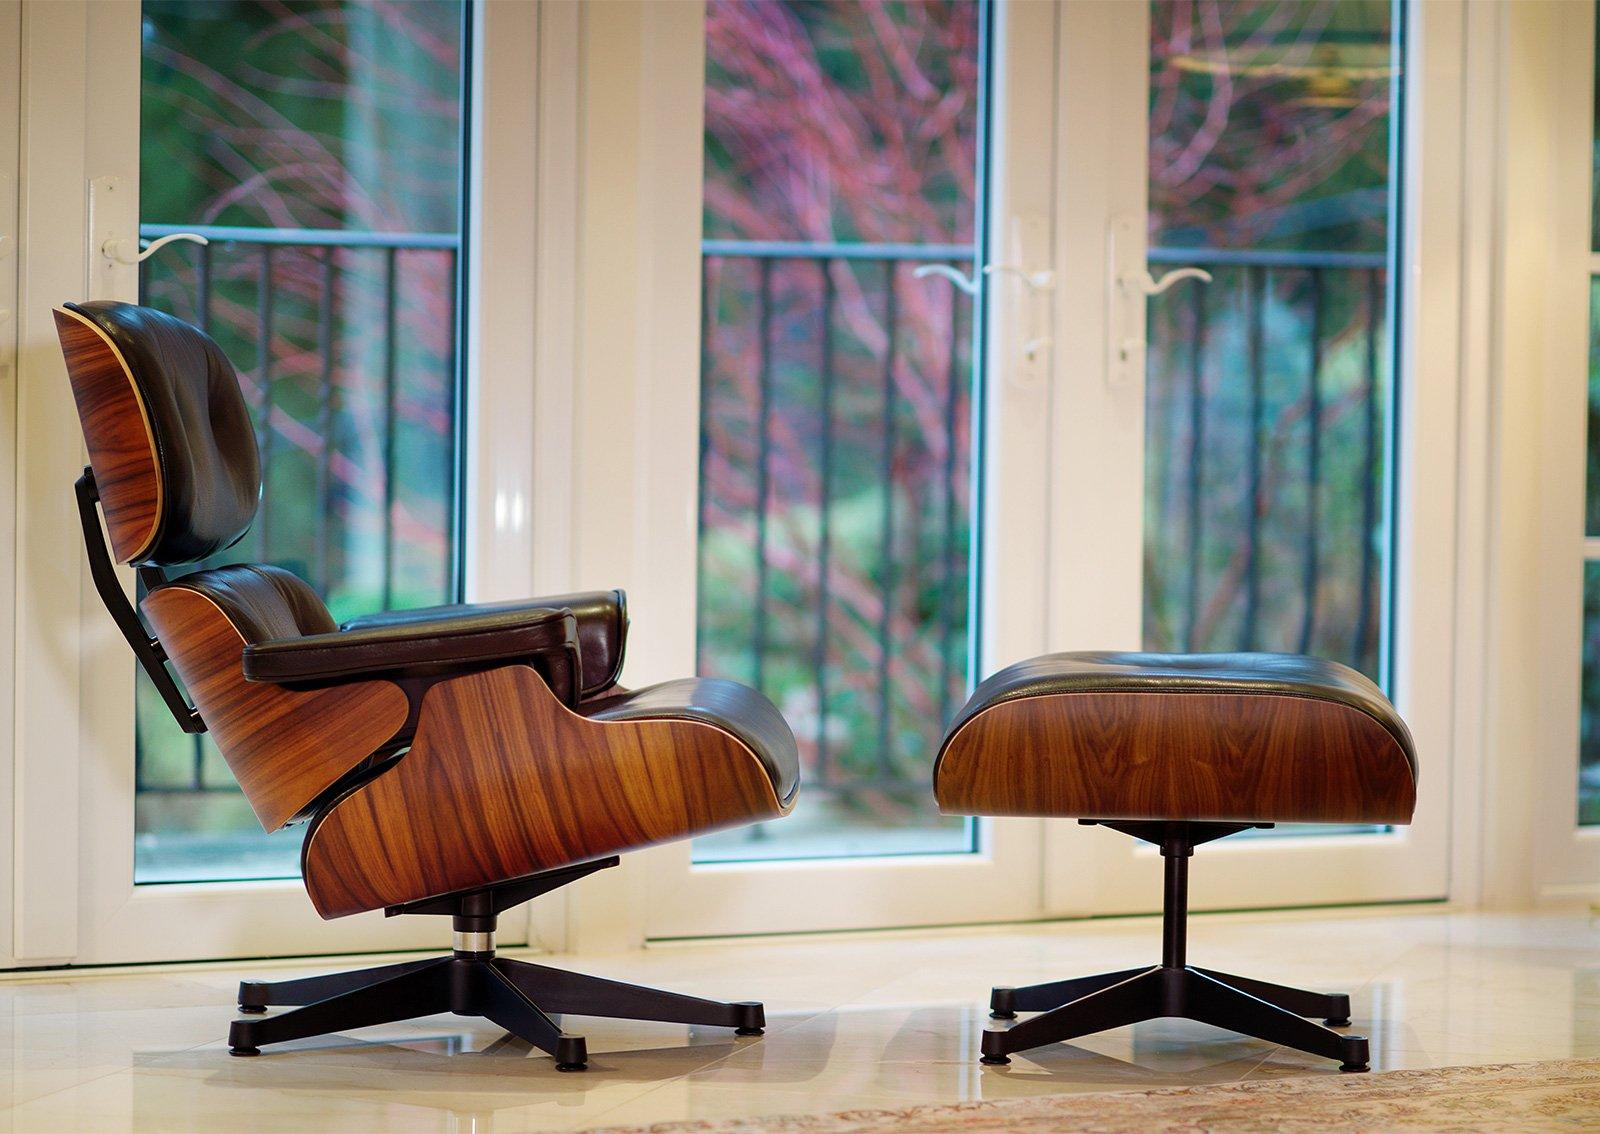 Peachy Eames Chairs Eames Lounge Chair With Ottoman Furnishplus Creativecarmelina Interior Chair Design Creativecarmelinacom